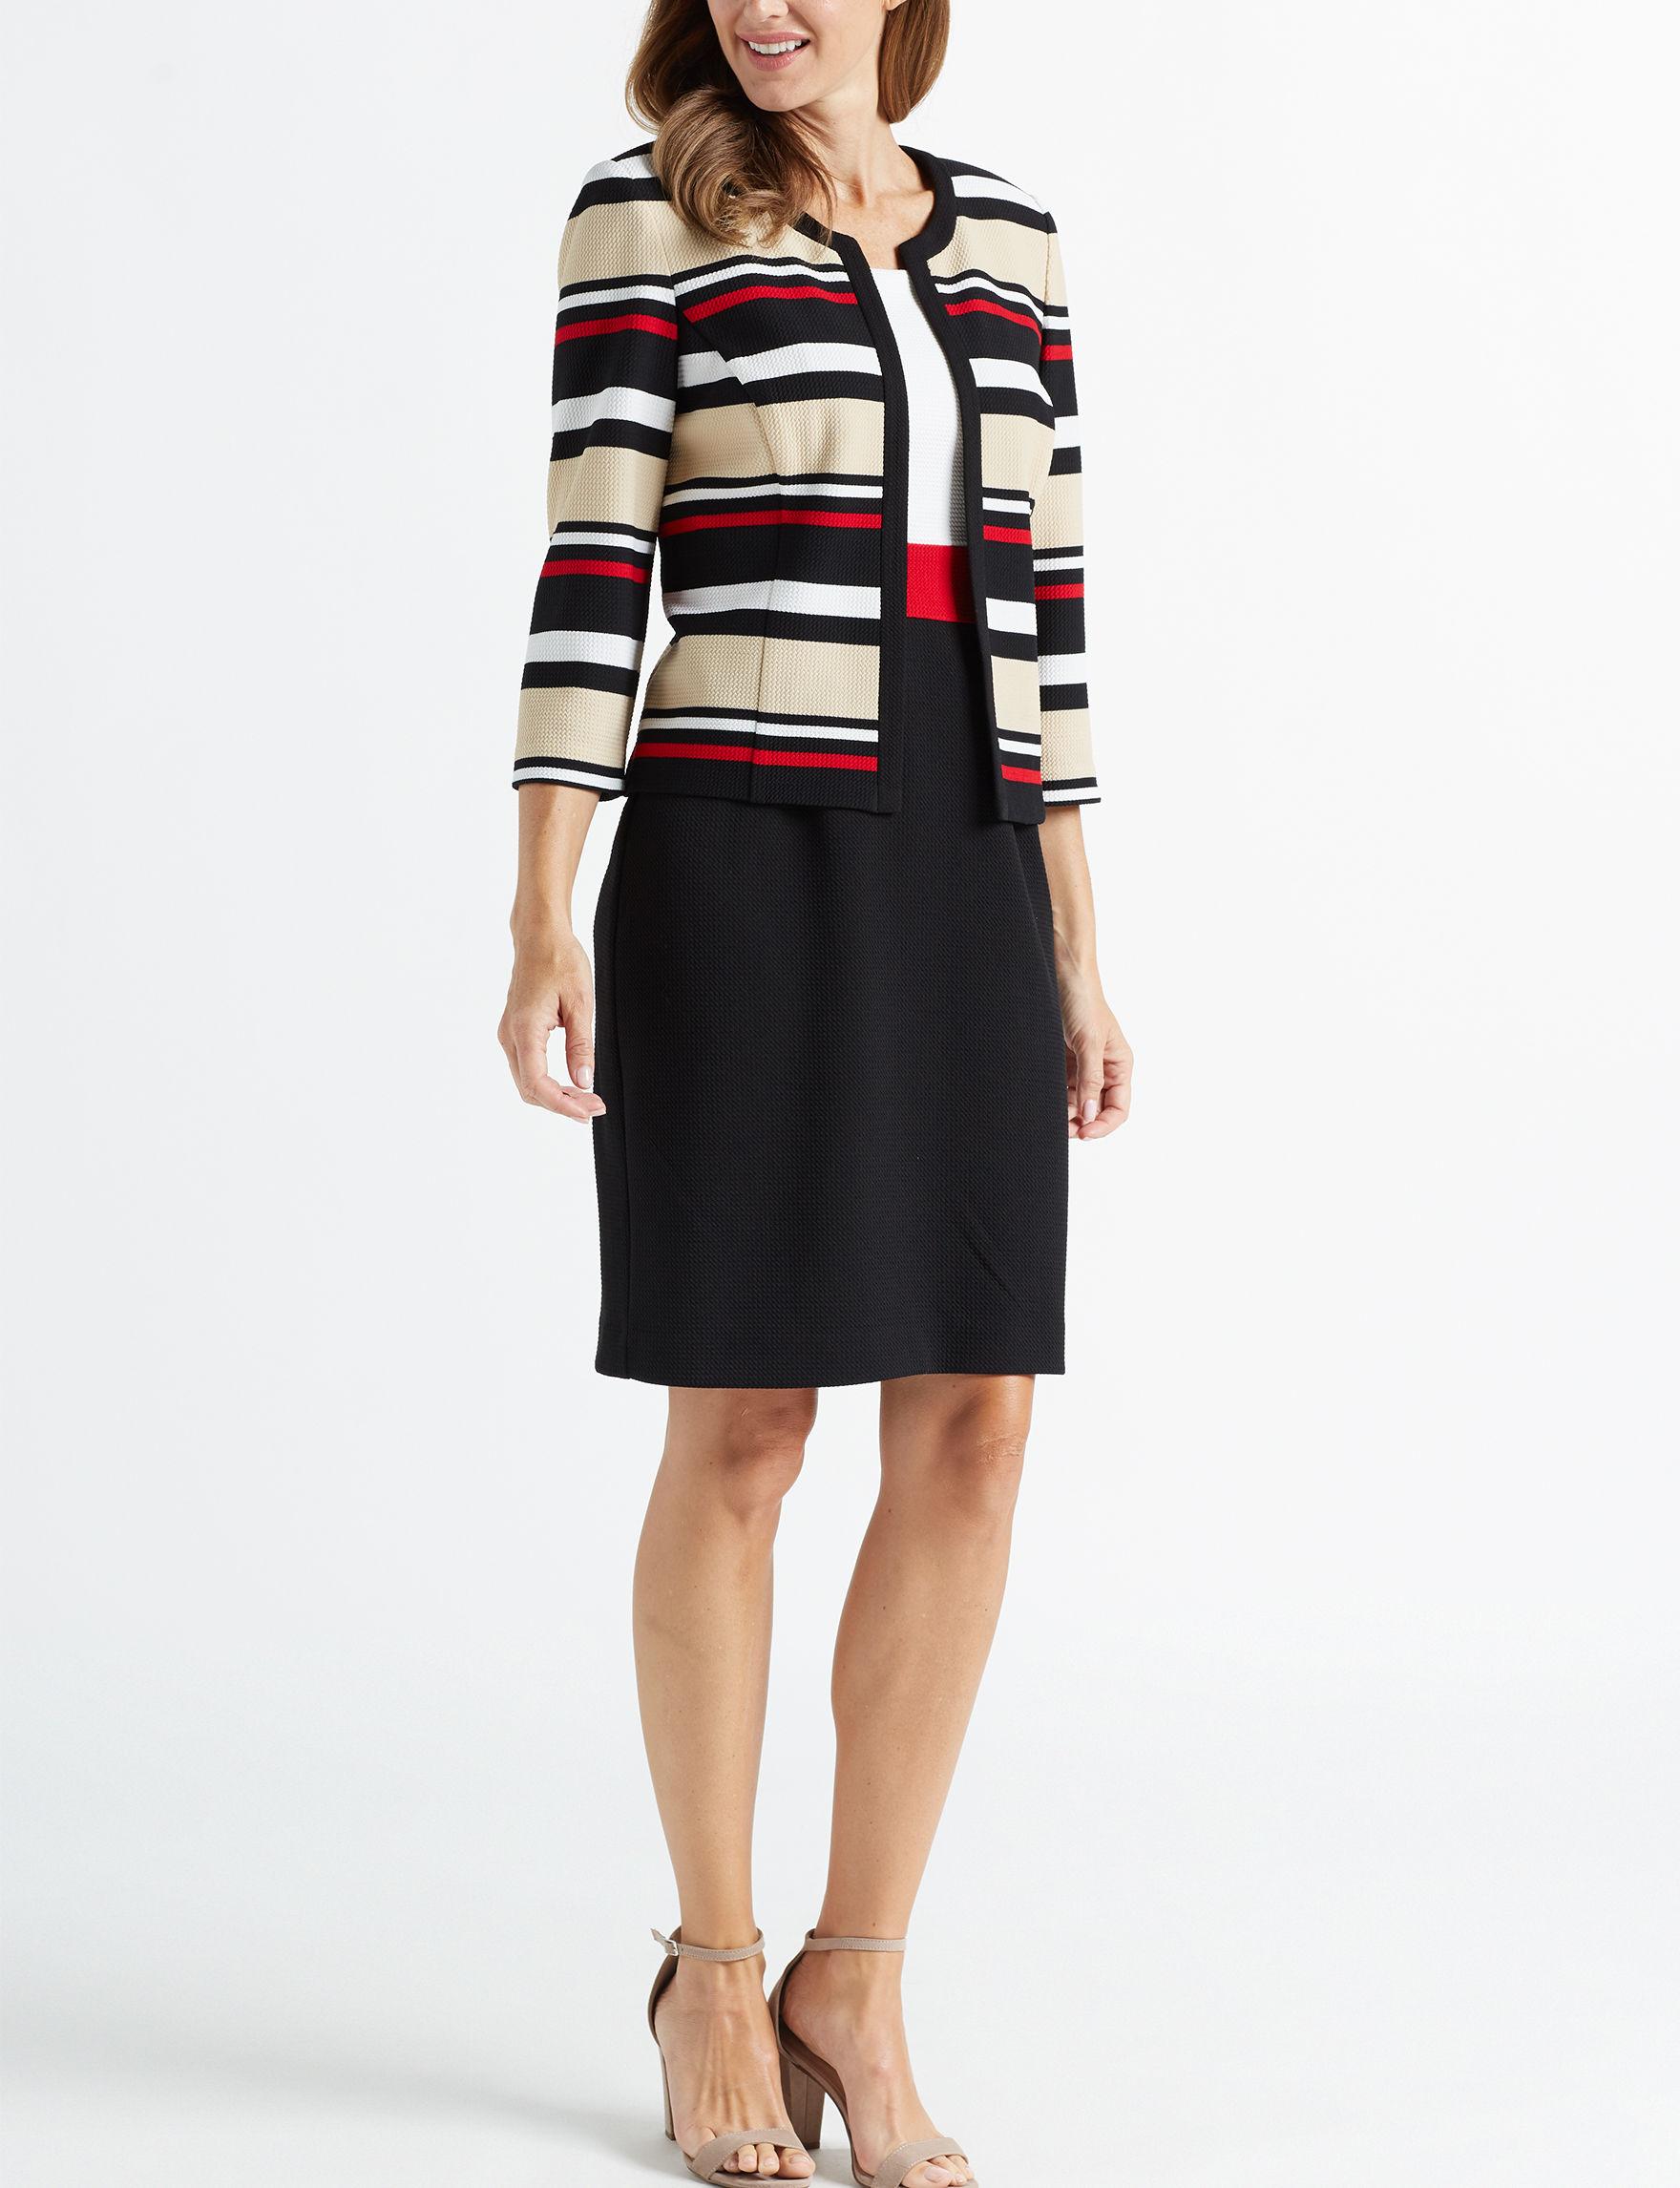 Sandra Darren Black Multi Everyday & Casual Jacket Dresses